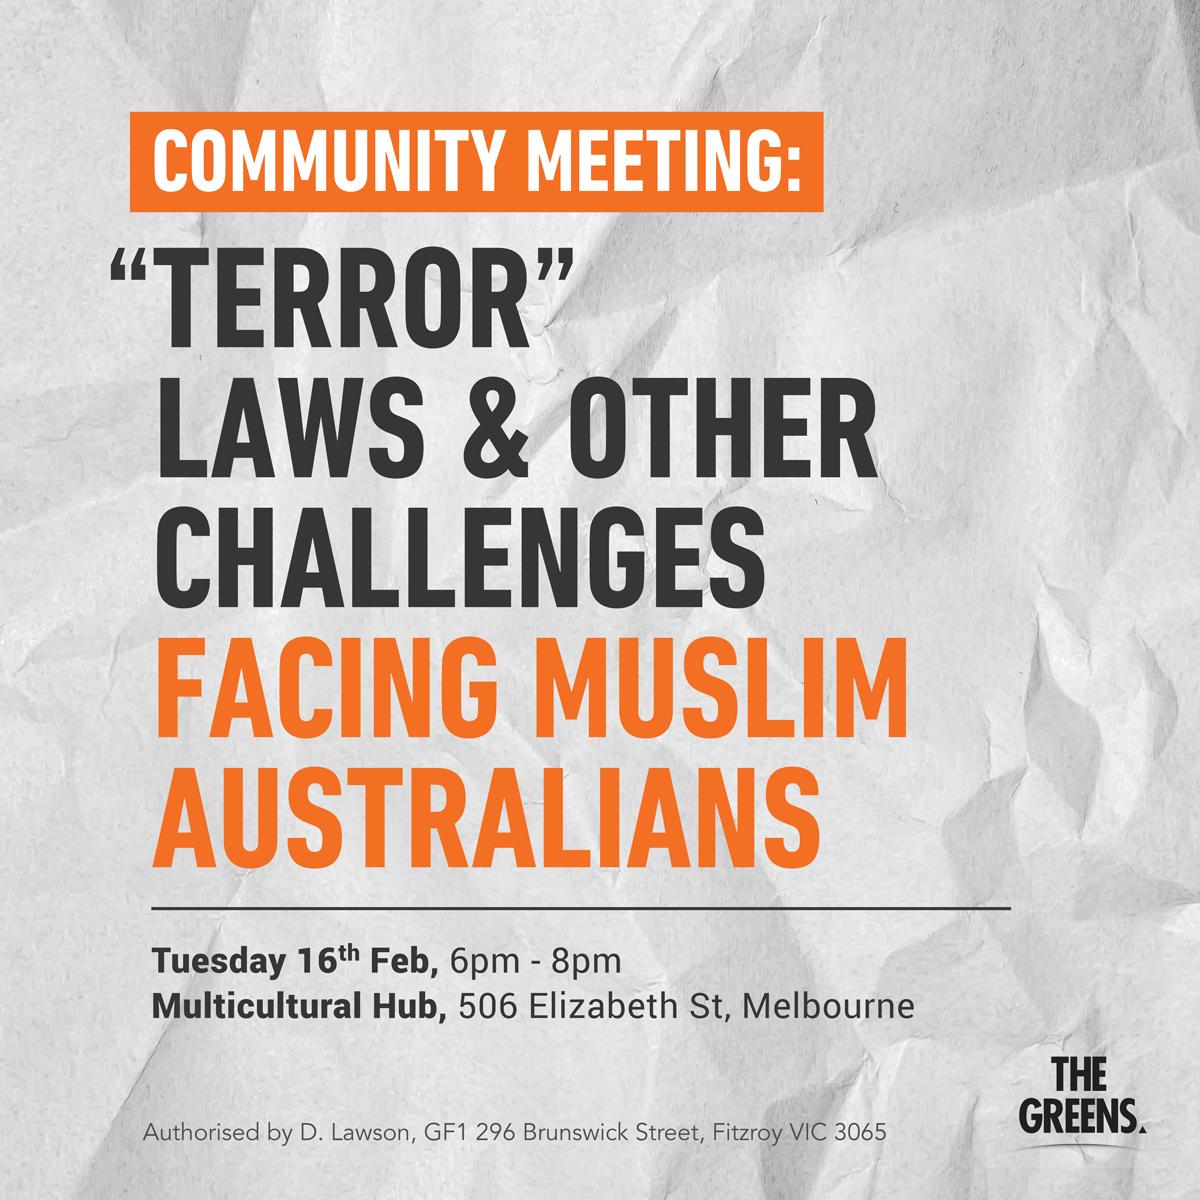 Community Meeting -- Terror Laws & Other Challenges Facing Muslim Australians